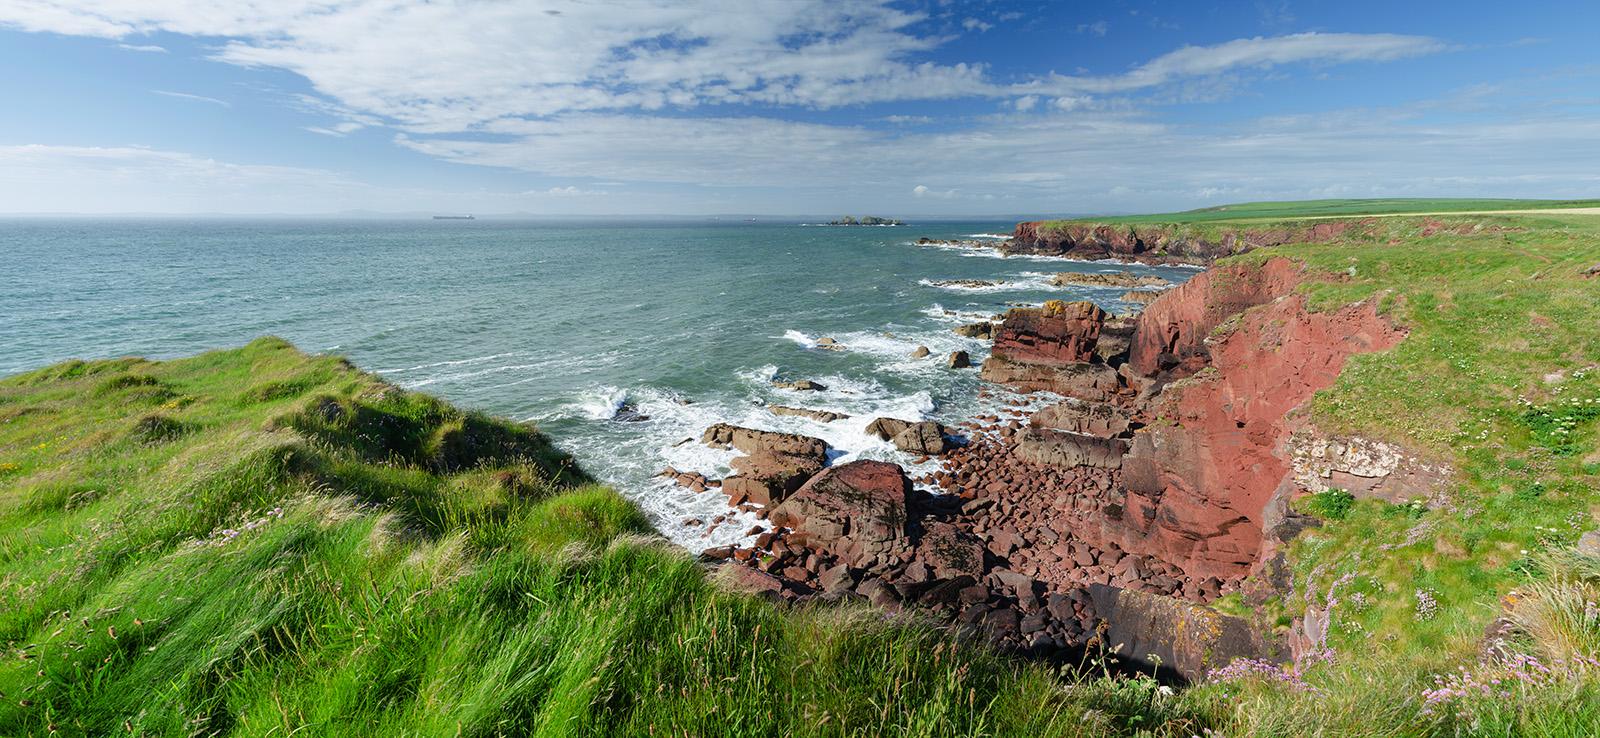 druidstone_haven_marloes-panorama13-2